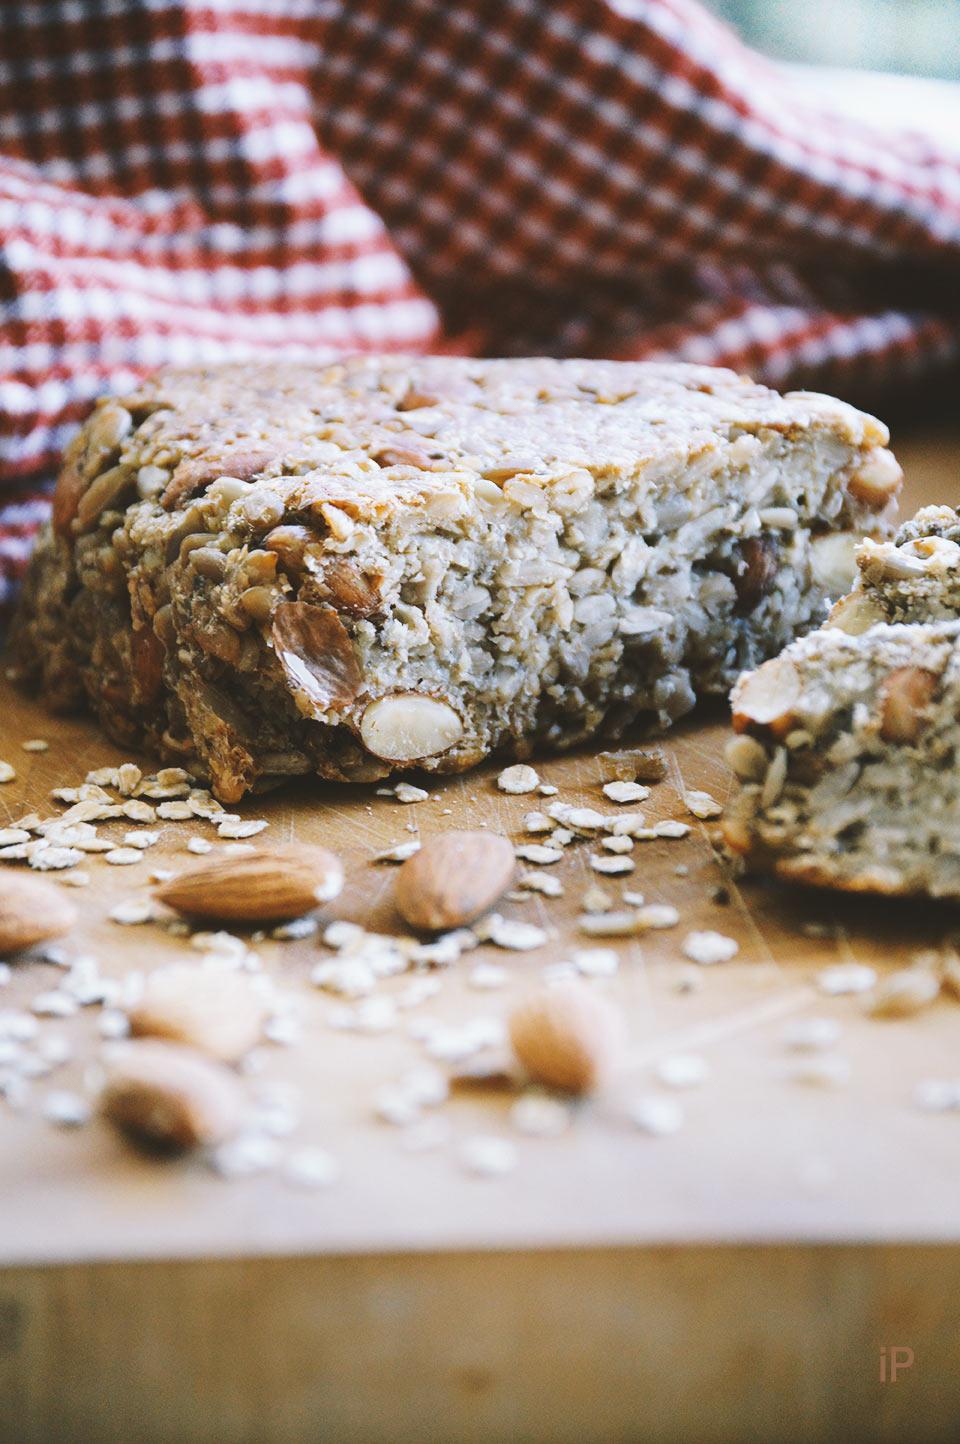 selbstgebackenes Brot mit Mandeln statt Mehl